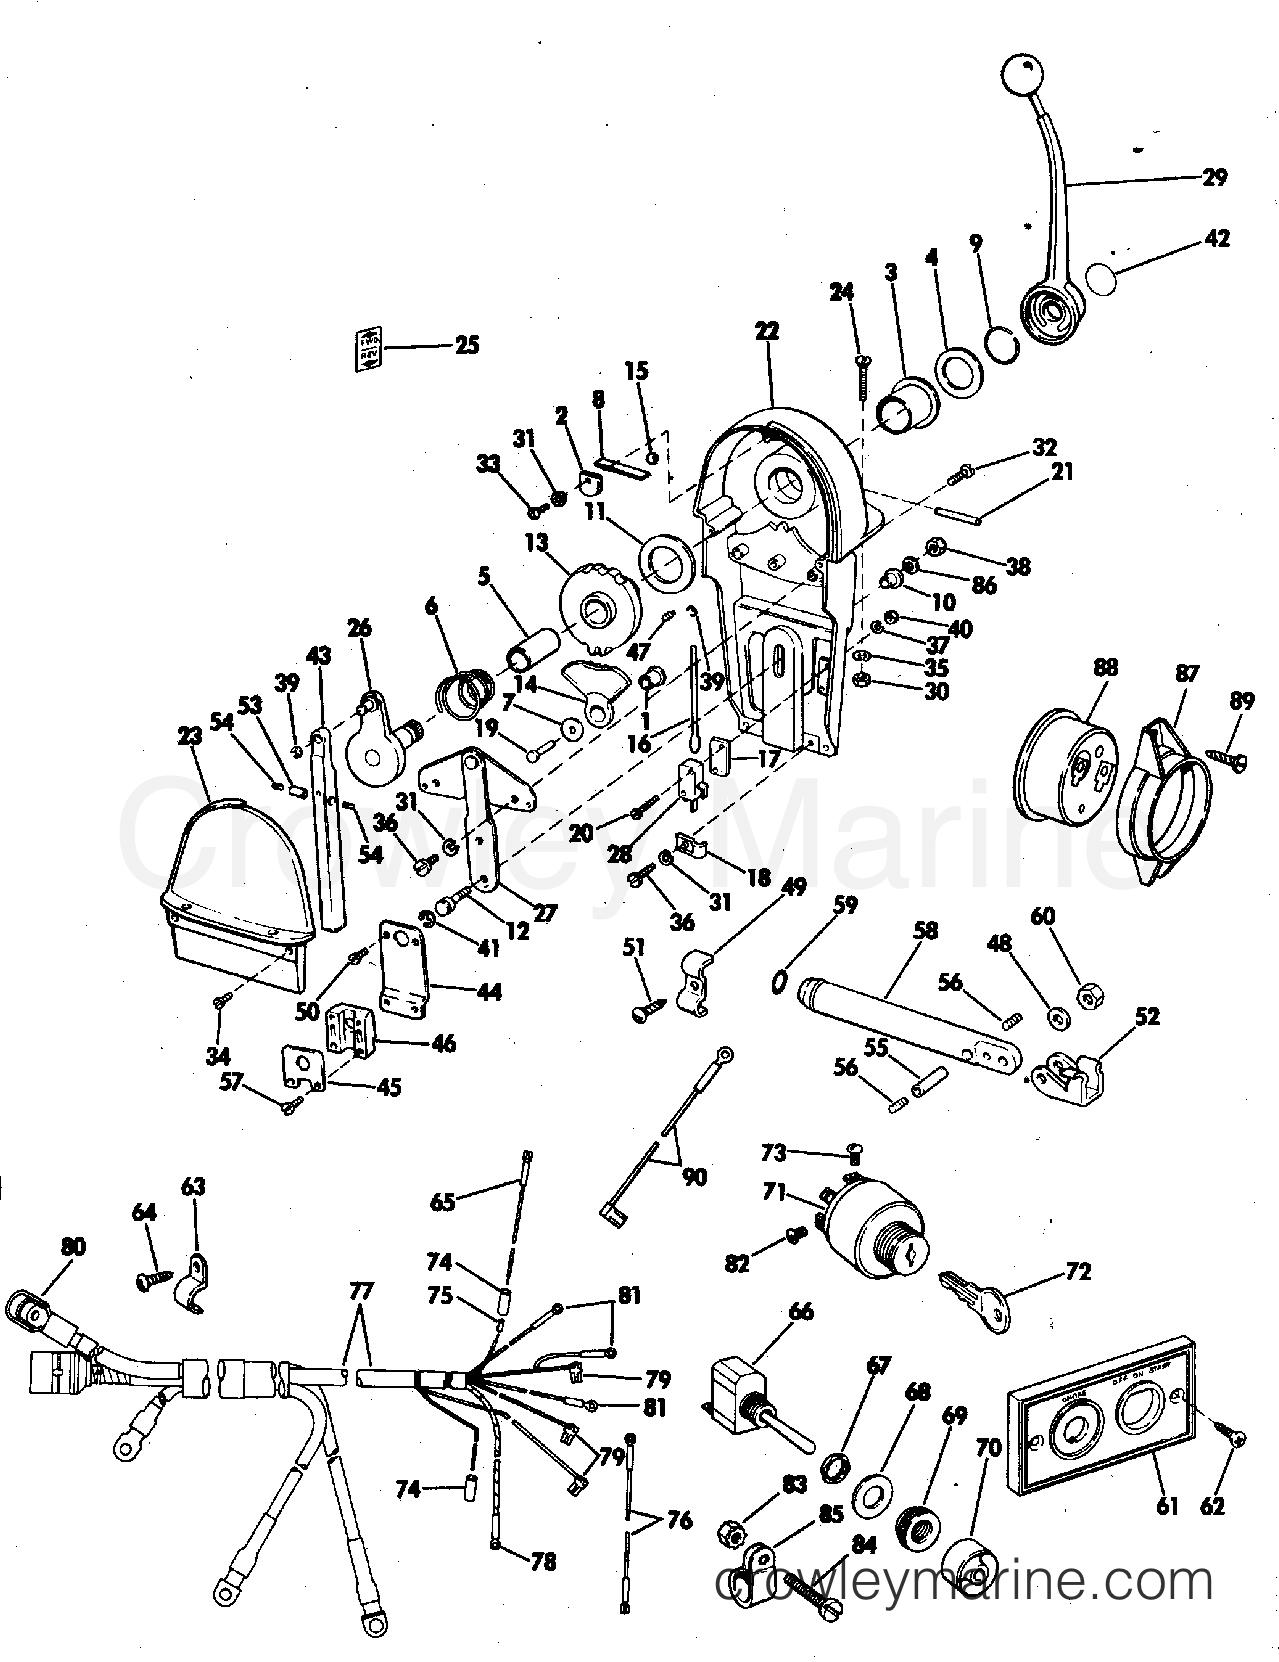 Binnacle Mount Control And Wiring Kit 55